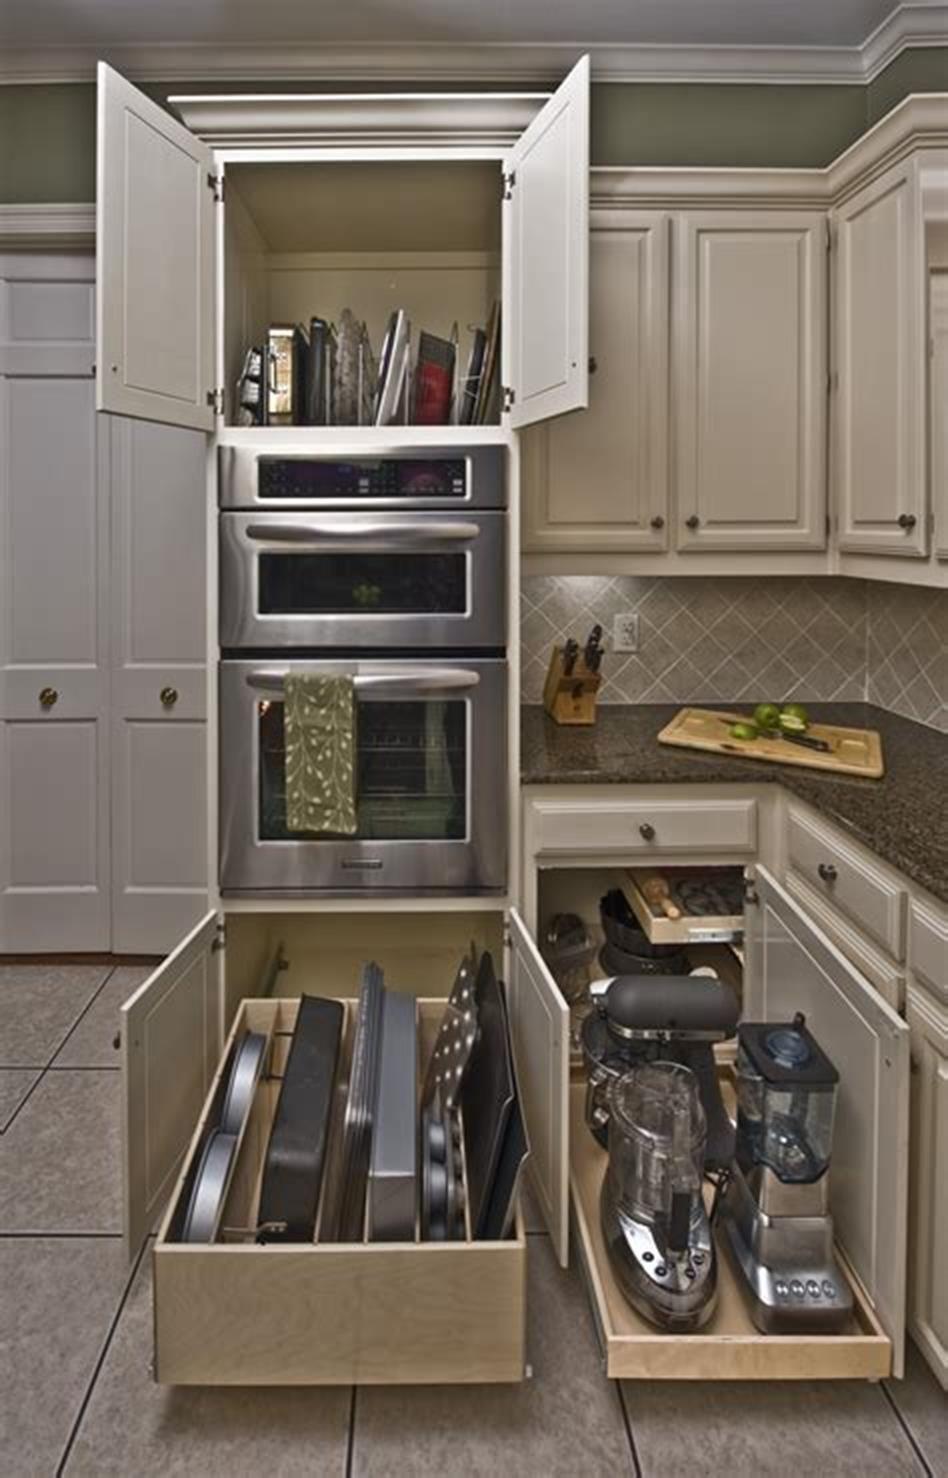 40+ DIY Ideas Kitchen Cabinet Organizers - HomEnthusiastic #cabinetorganizers